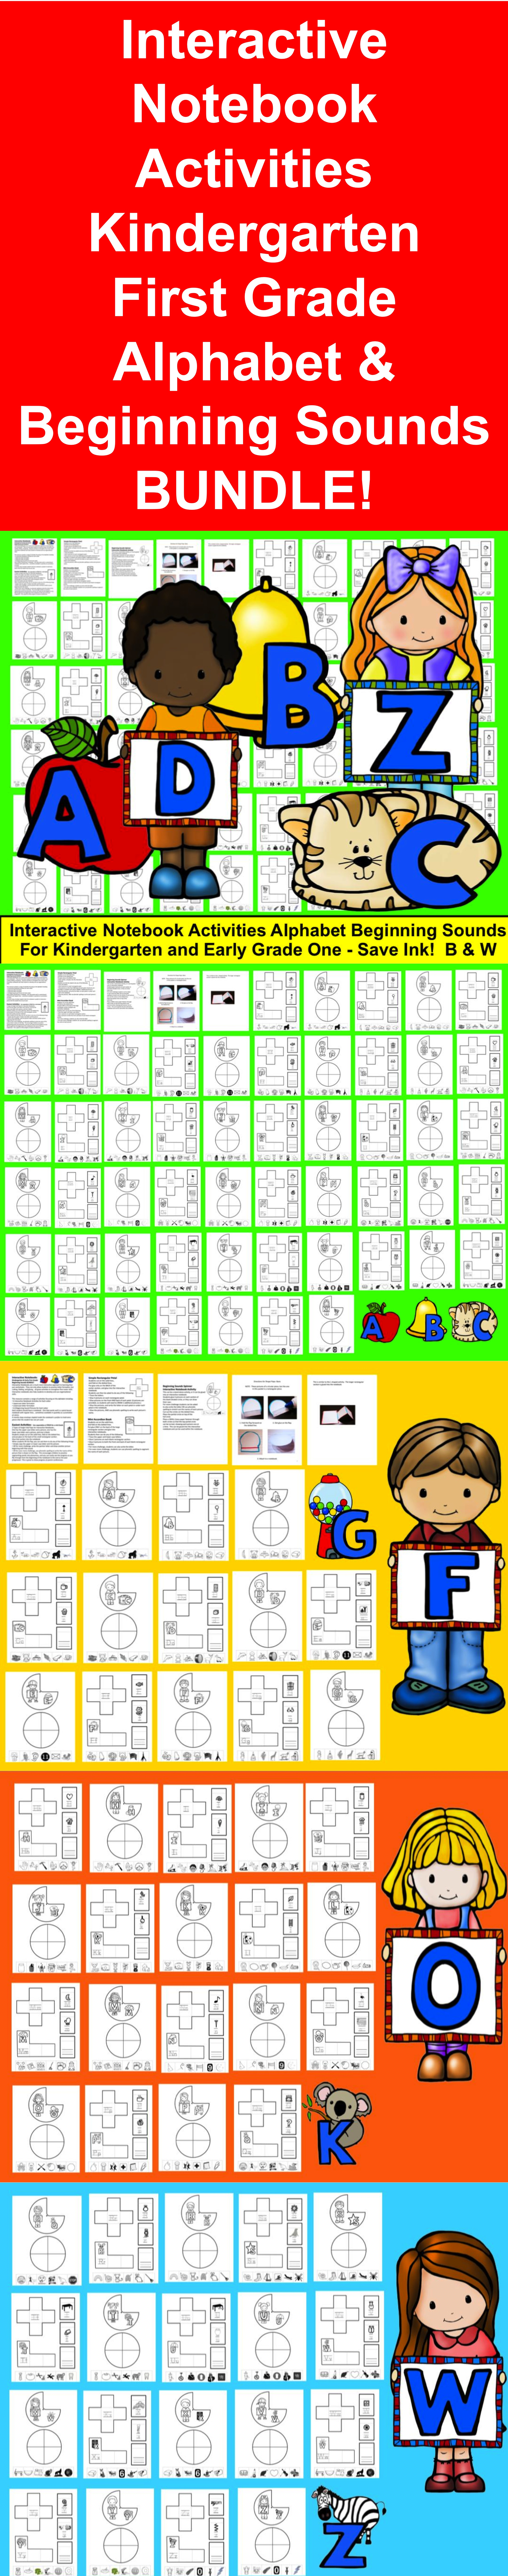 Interactive Notebook Alphabet And Beginning Sounds Bundle